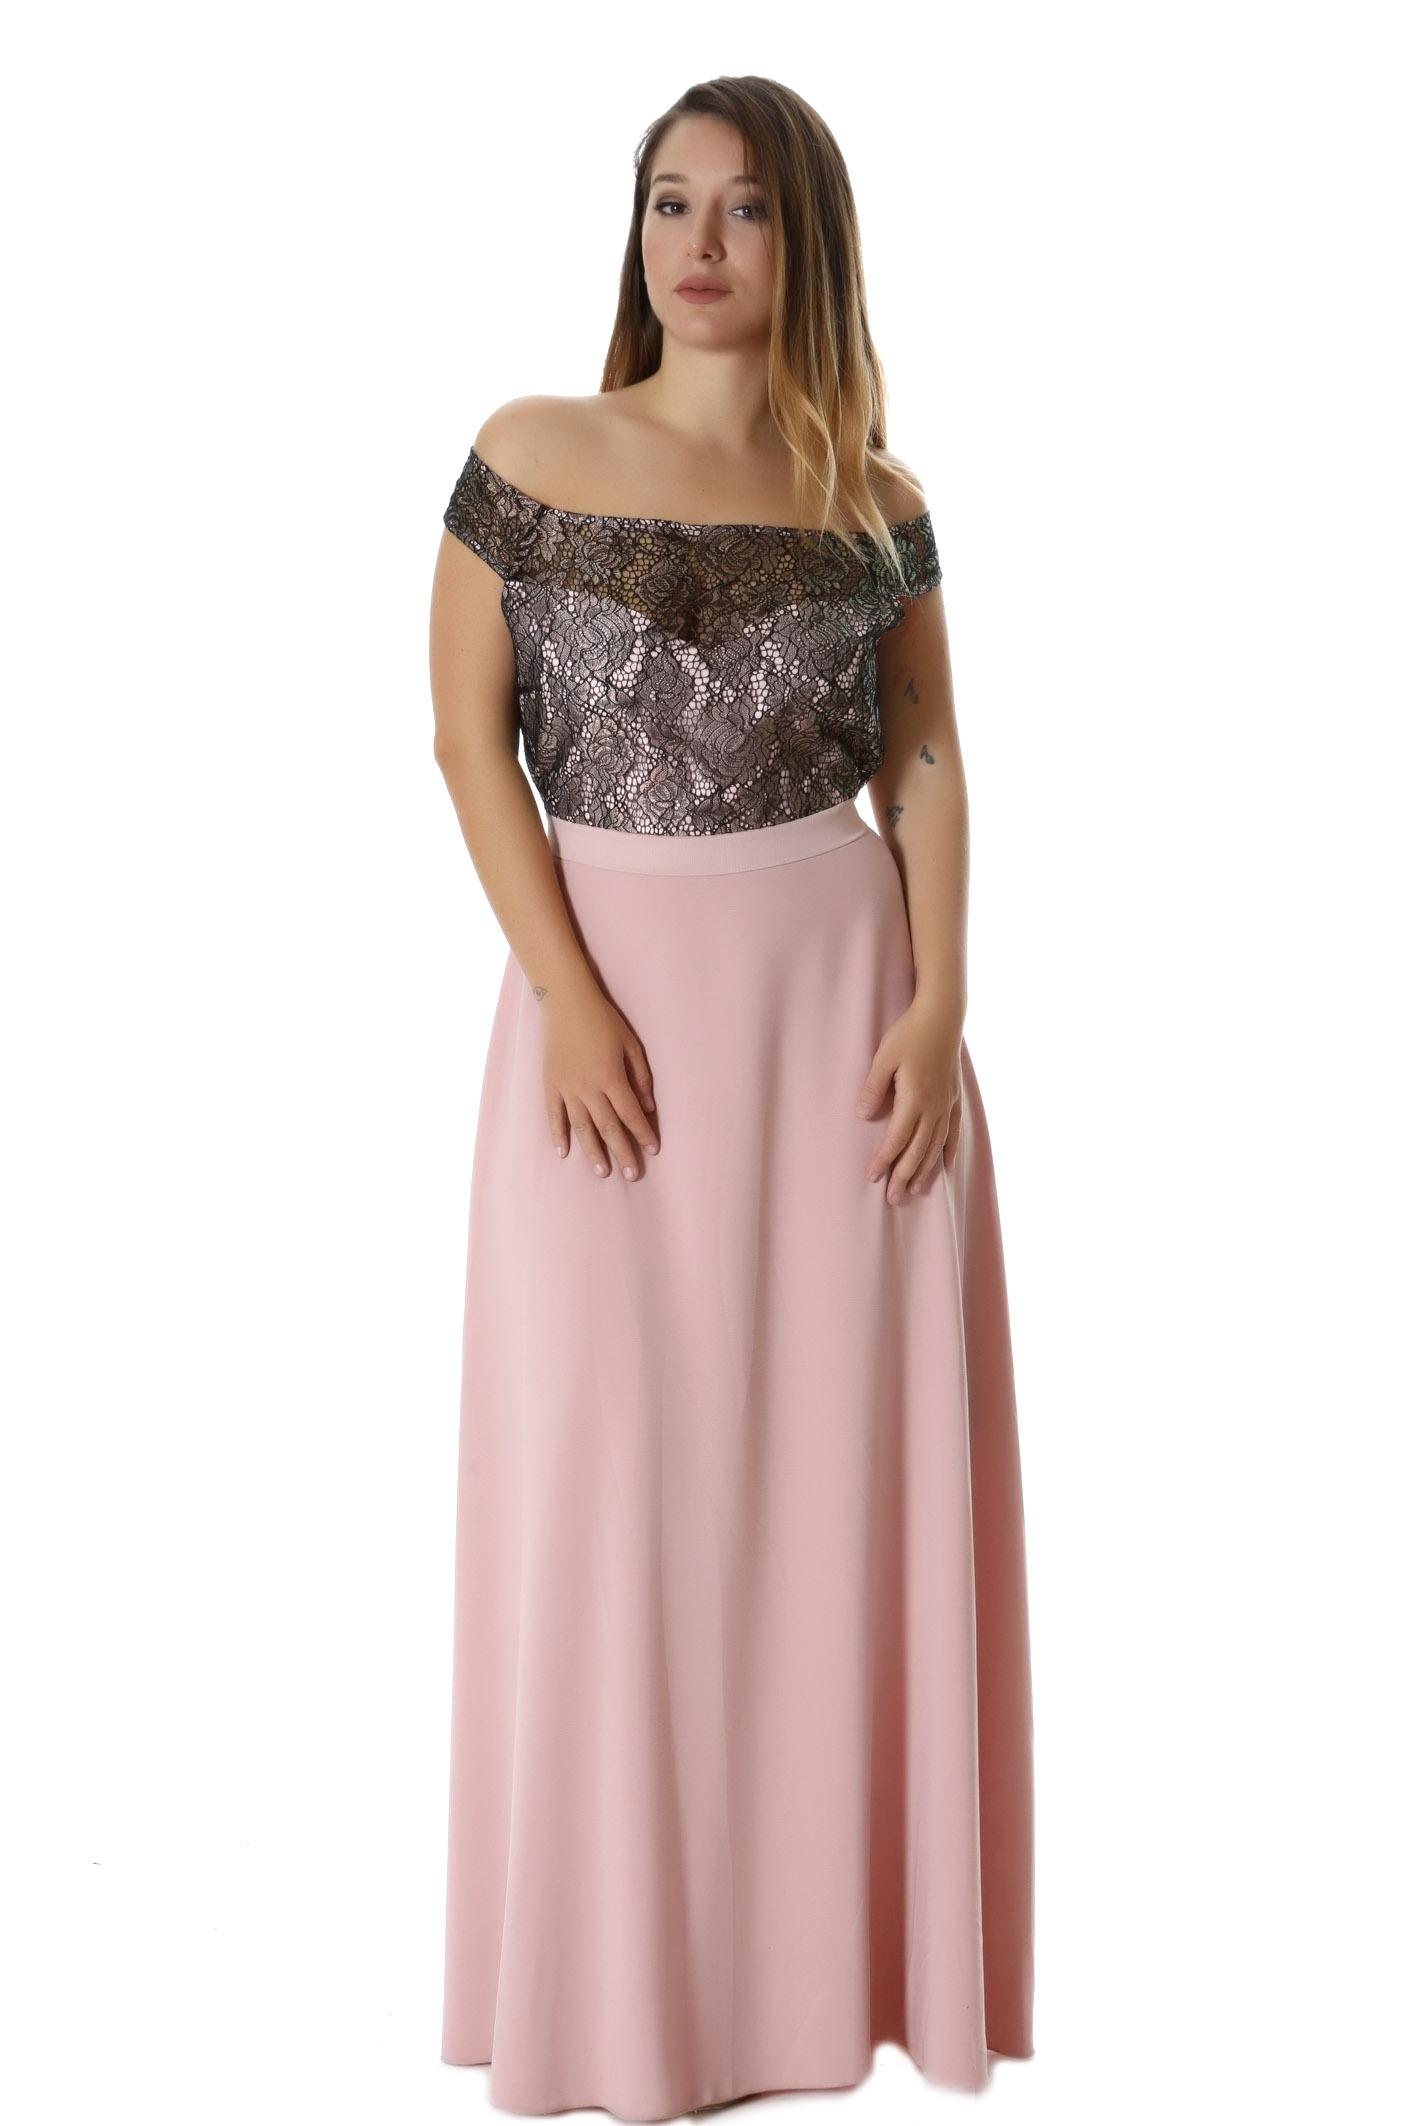 294b1b4764a3 Γυναικεία > Ρούχα > Φορέματα > Μακριά / Maxi φόρεμα παγέτα σε ροζ ...